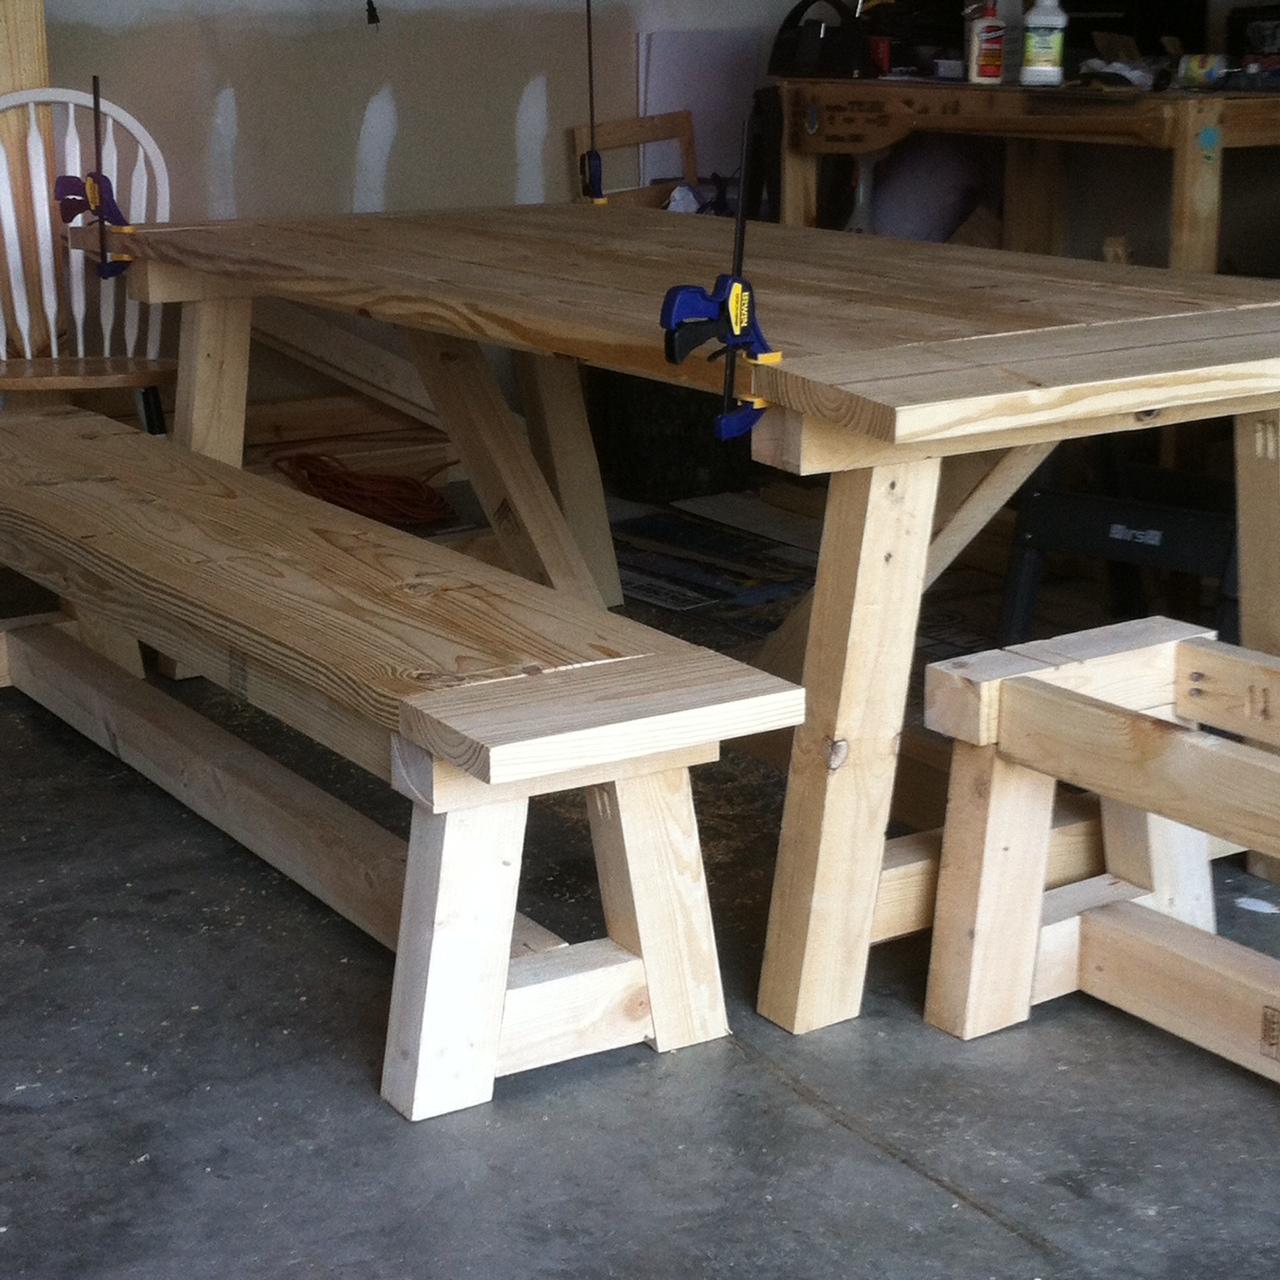 Peachy My Diy Farmhouse Table 44 Truss Beam Thinking Out Loud Machost Co Dining Chair Design Ideas Machostcouk